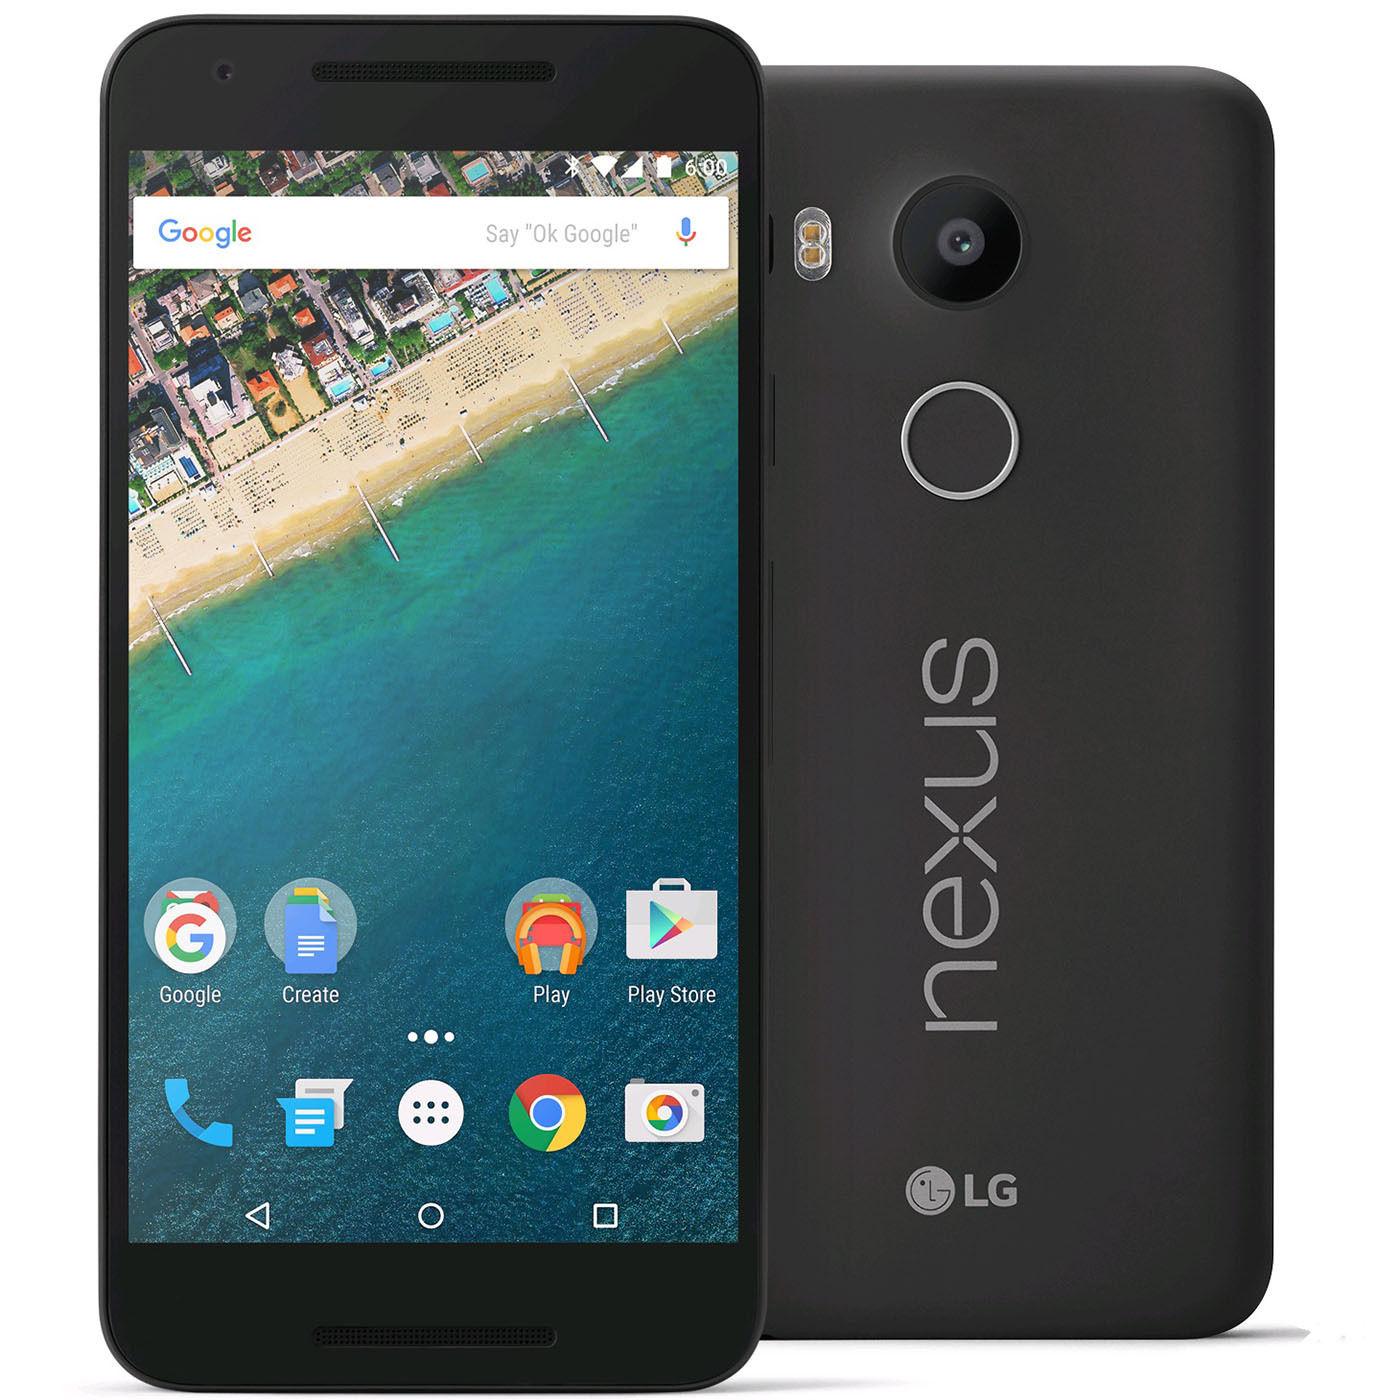 Nexus 5x 32gb $239.99 eBay daily deal